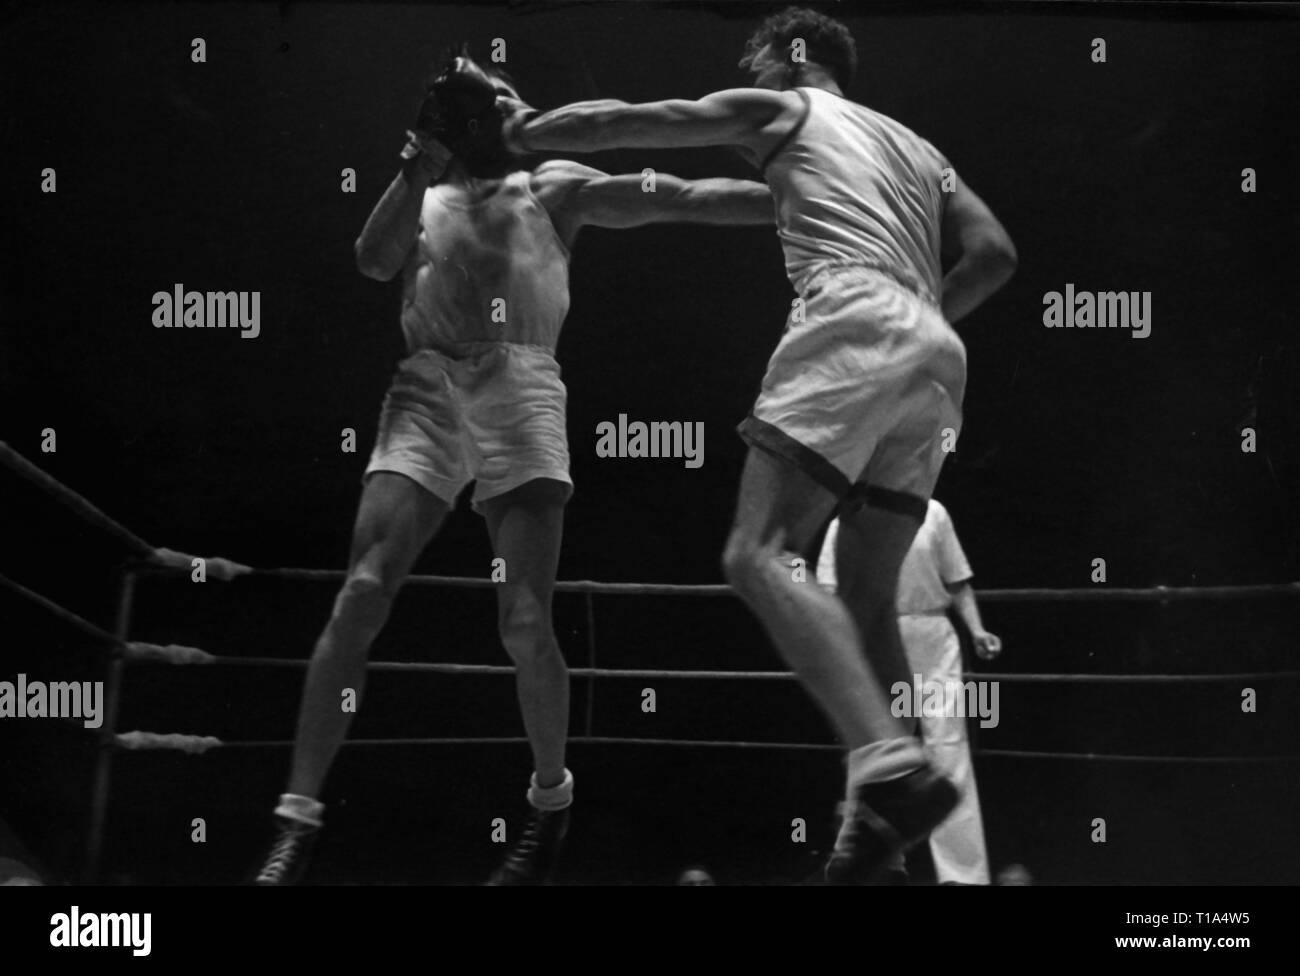 sports, boxing, boxing match John Ryan (Great Britain) against Victor Joergensen (Denmark), European amateur welterweight championship, K. B. Hallen, Copenhagen, 18.10.1947, Additional-Rights-Clearance-Info-Not-Available - Stock Image